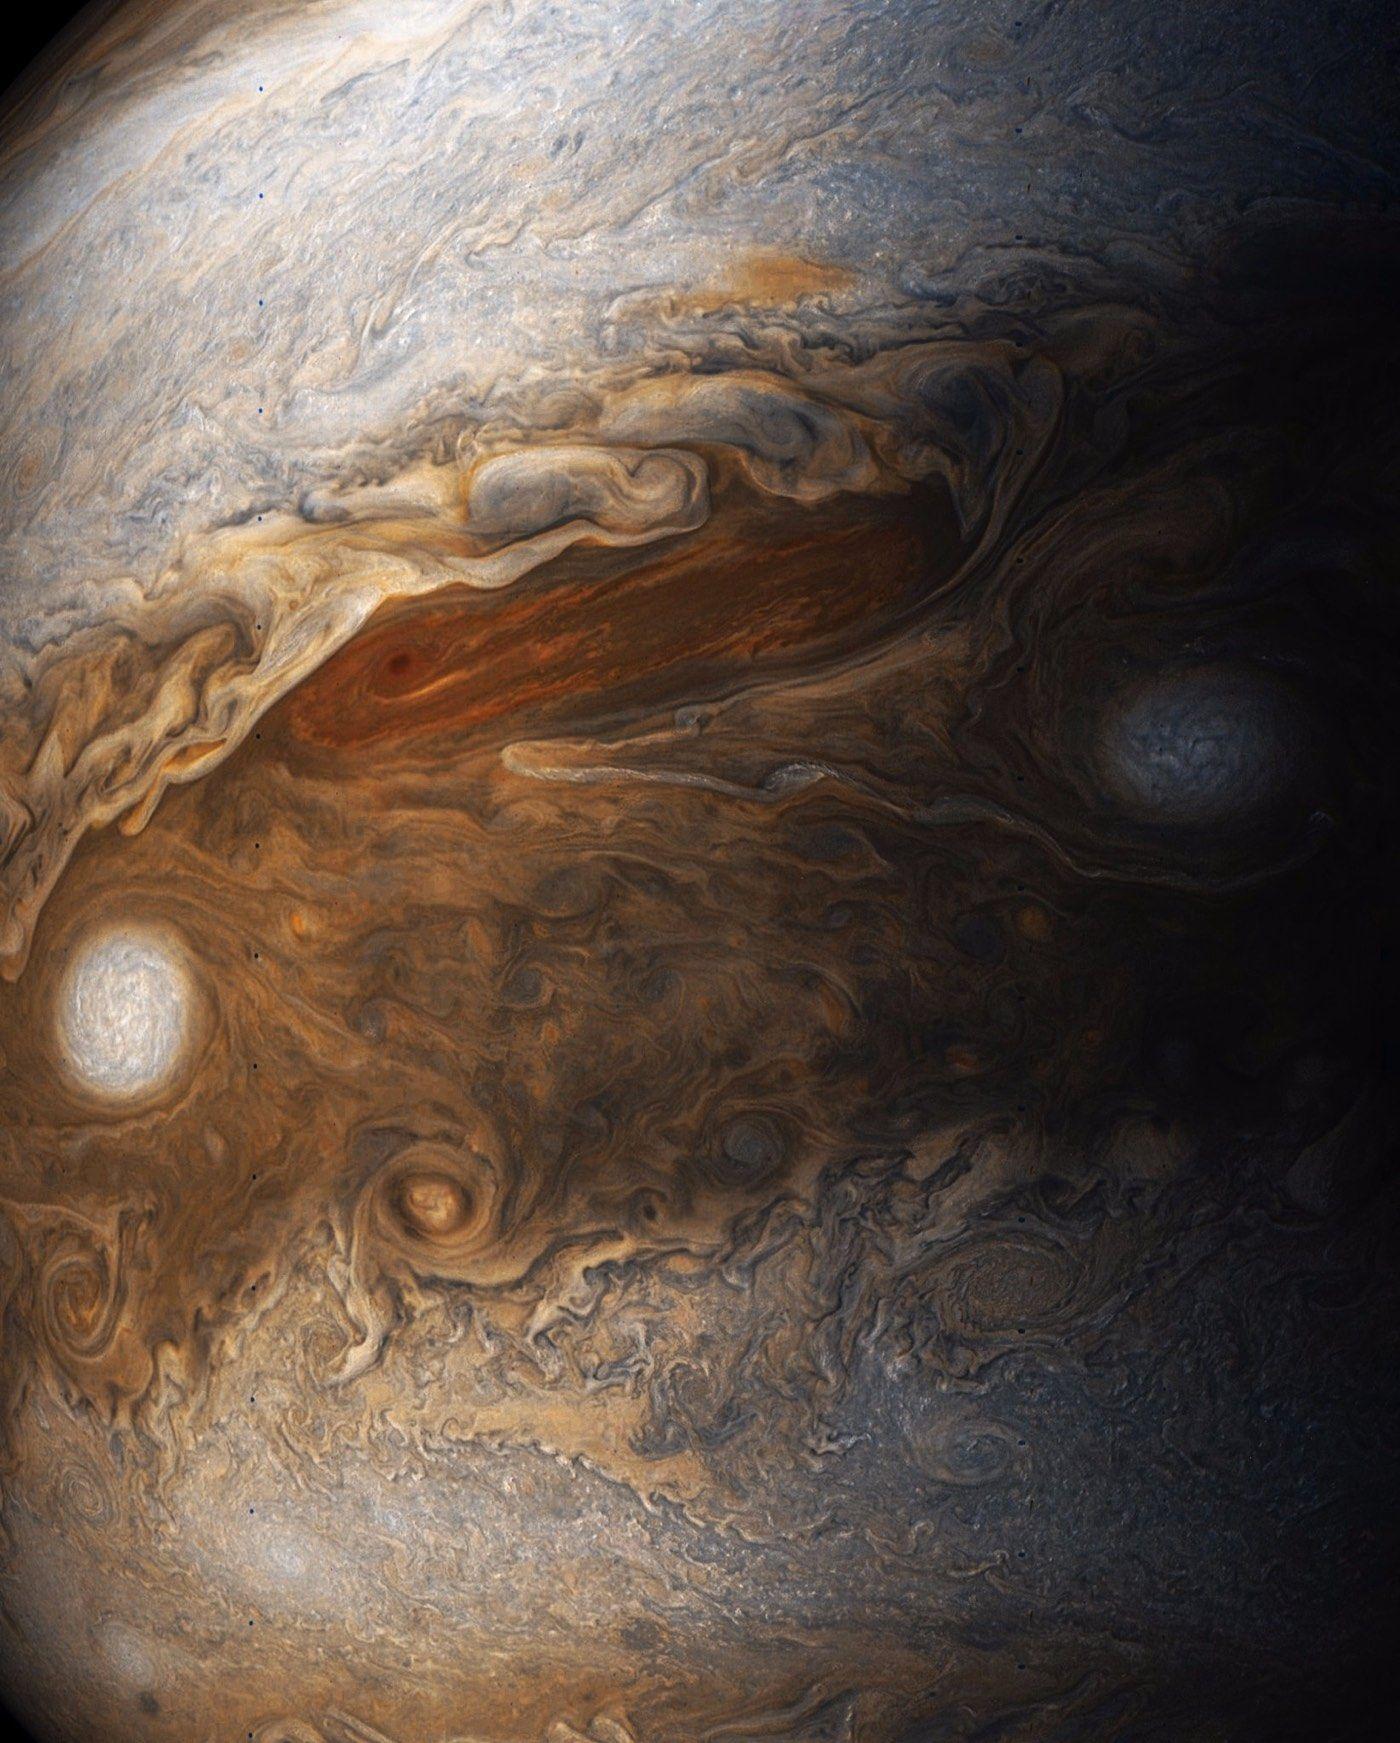 Newly Processed Photos Of Jupiter Taken By NASAs Juno Probe - Nasas juno spacecraft has captured incredible images of jupiters surface